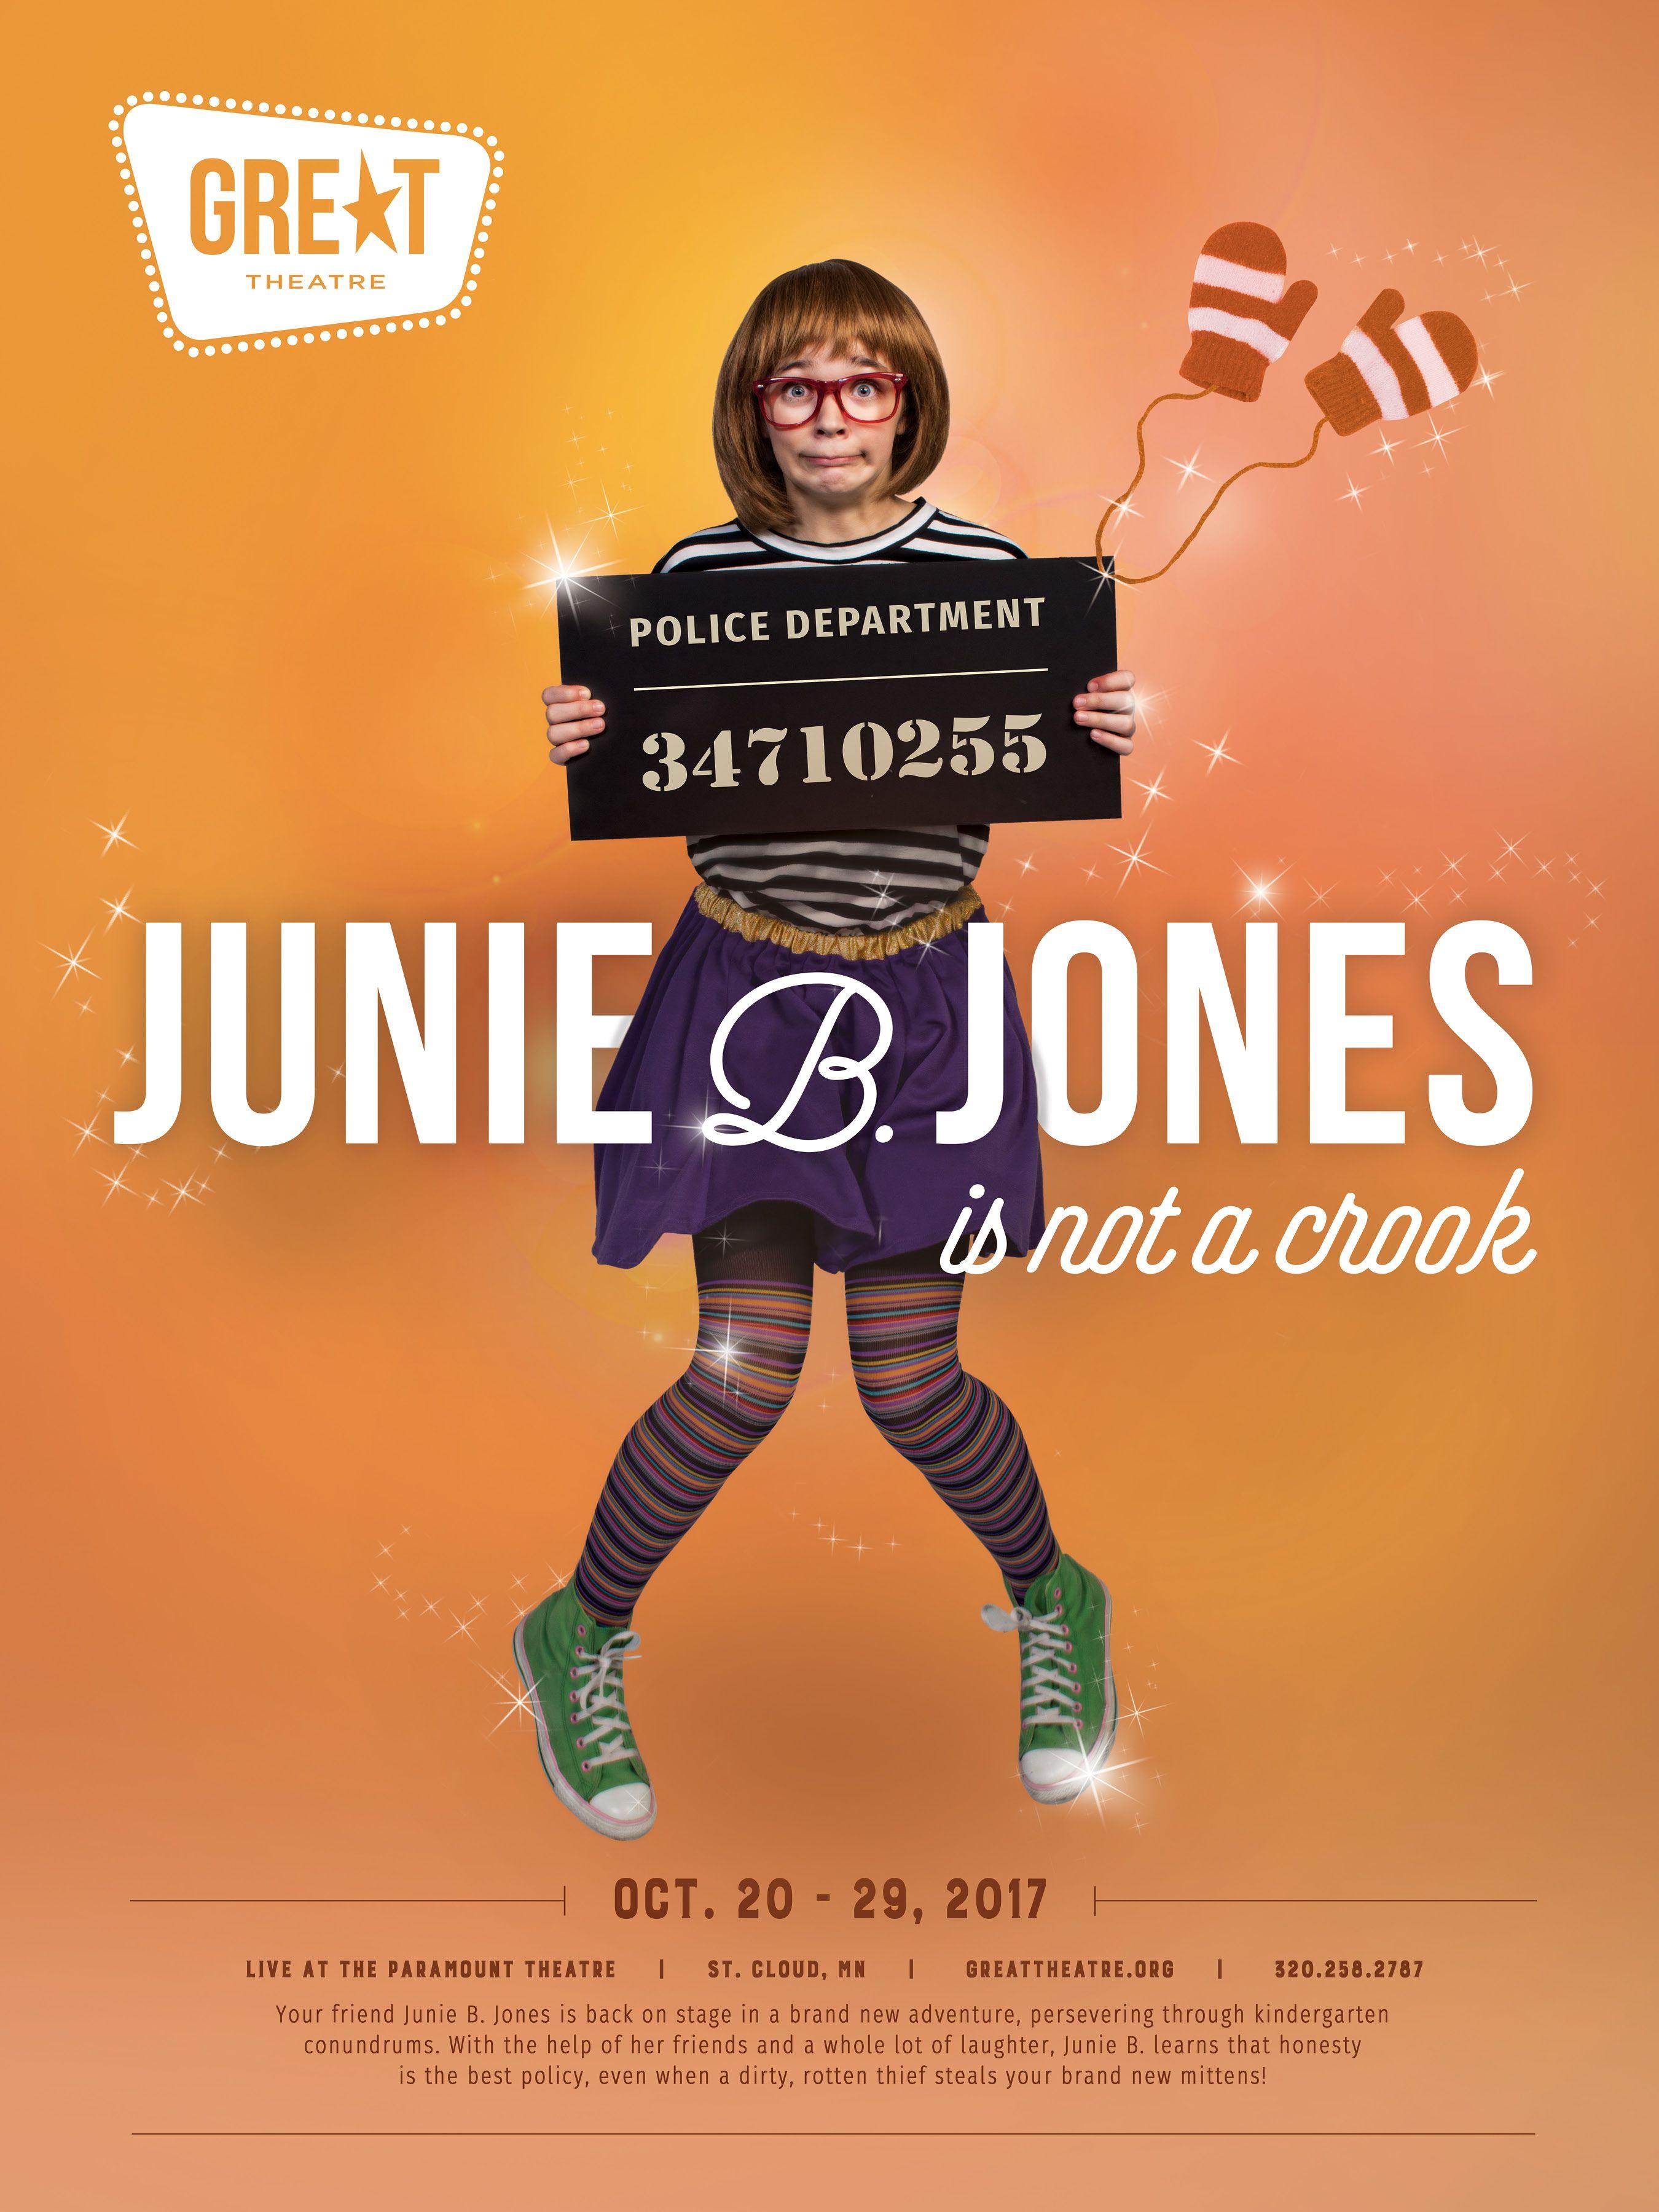 Great theatre junie b jones is not a crook junie b